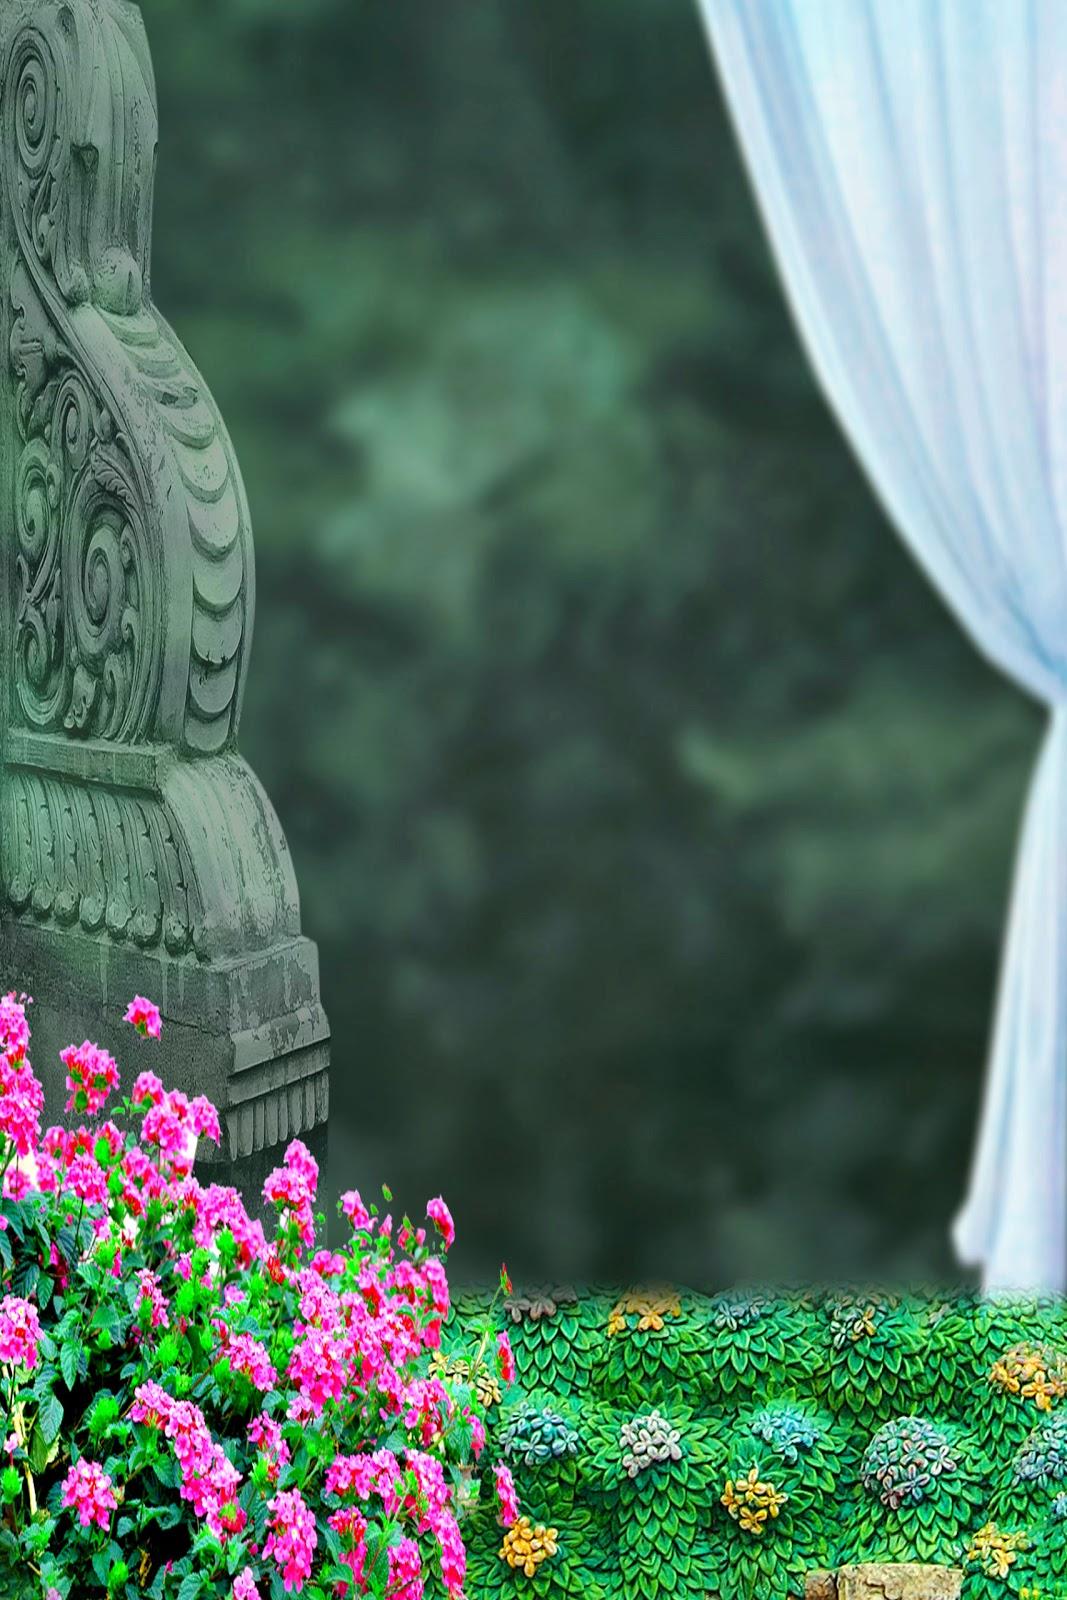 New Studio Background For Wedding Pics Edting Psd File Luckystudio4u